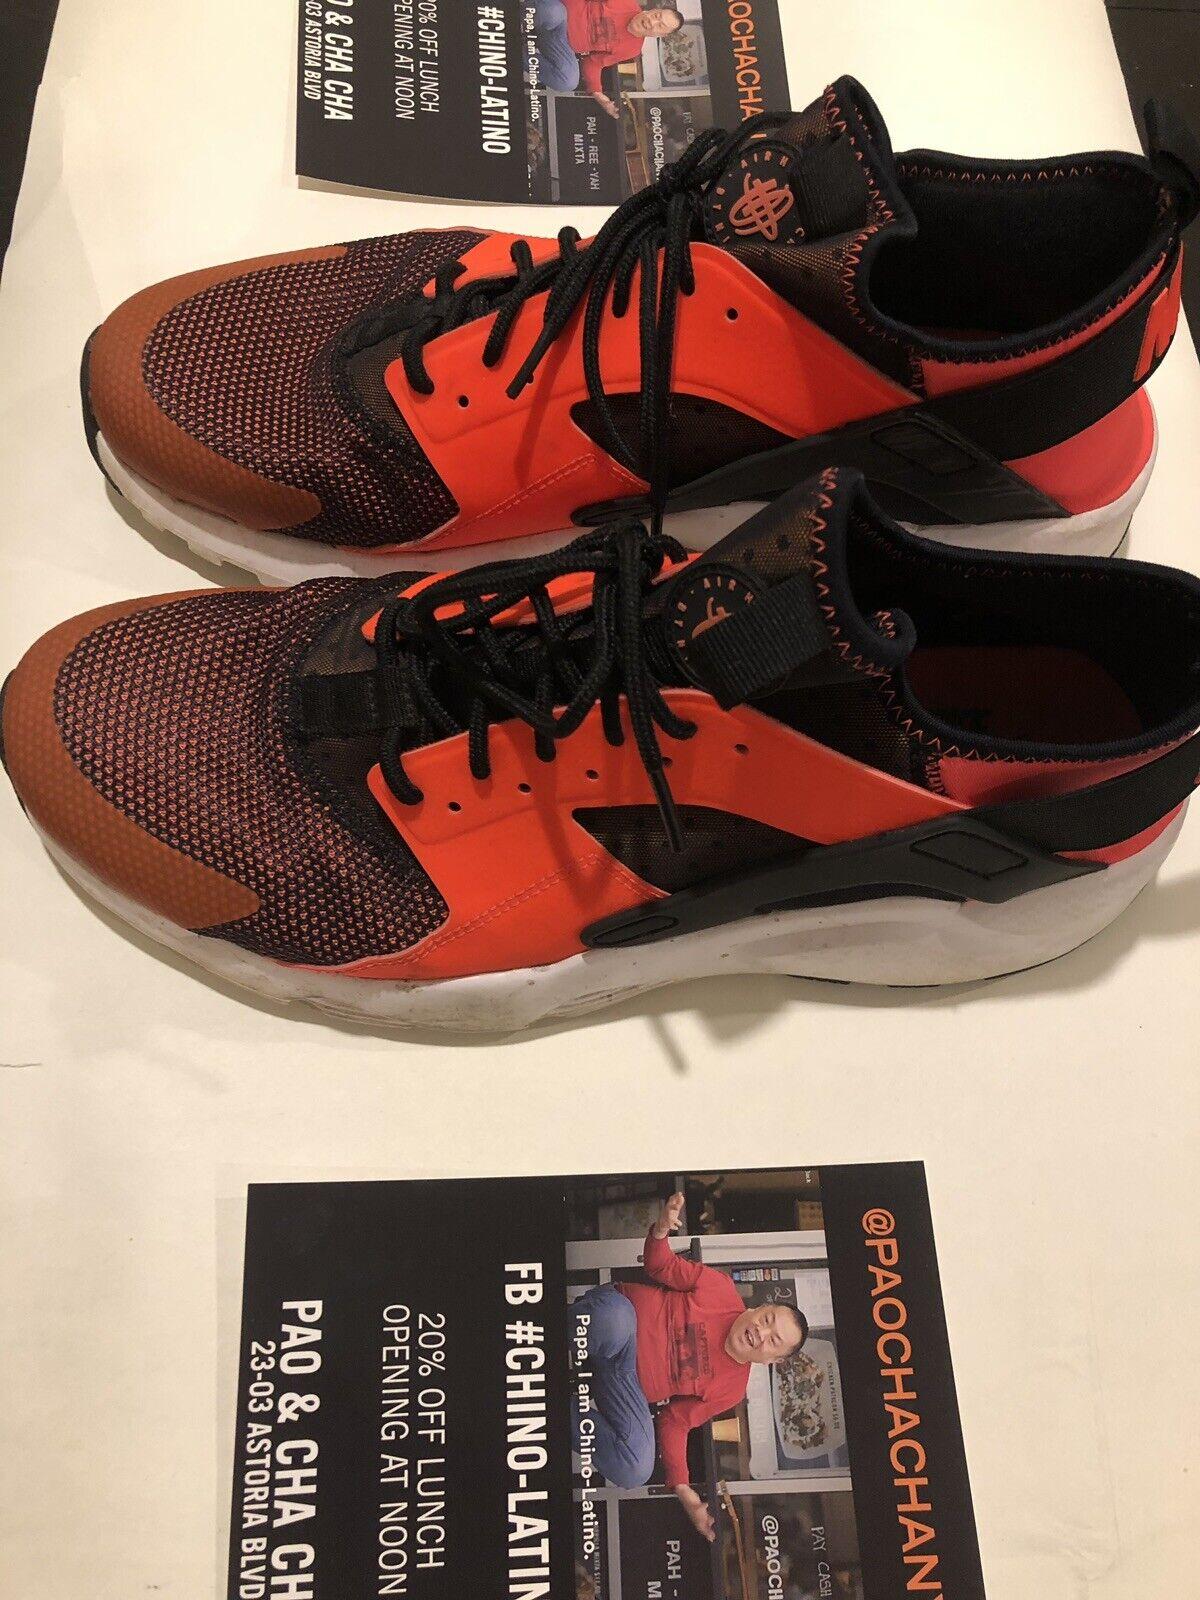 Nike Air Huarache Run Ultra Black Total Crimson White orange 819685-008 Sz 12.5